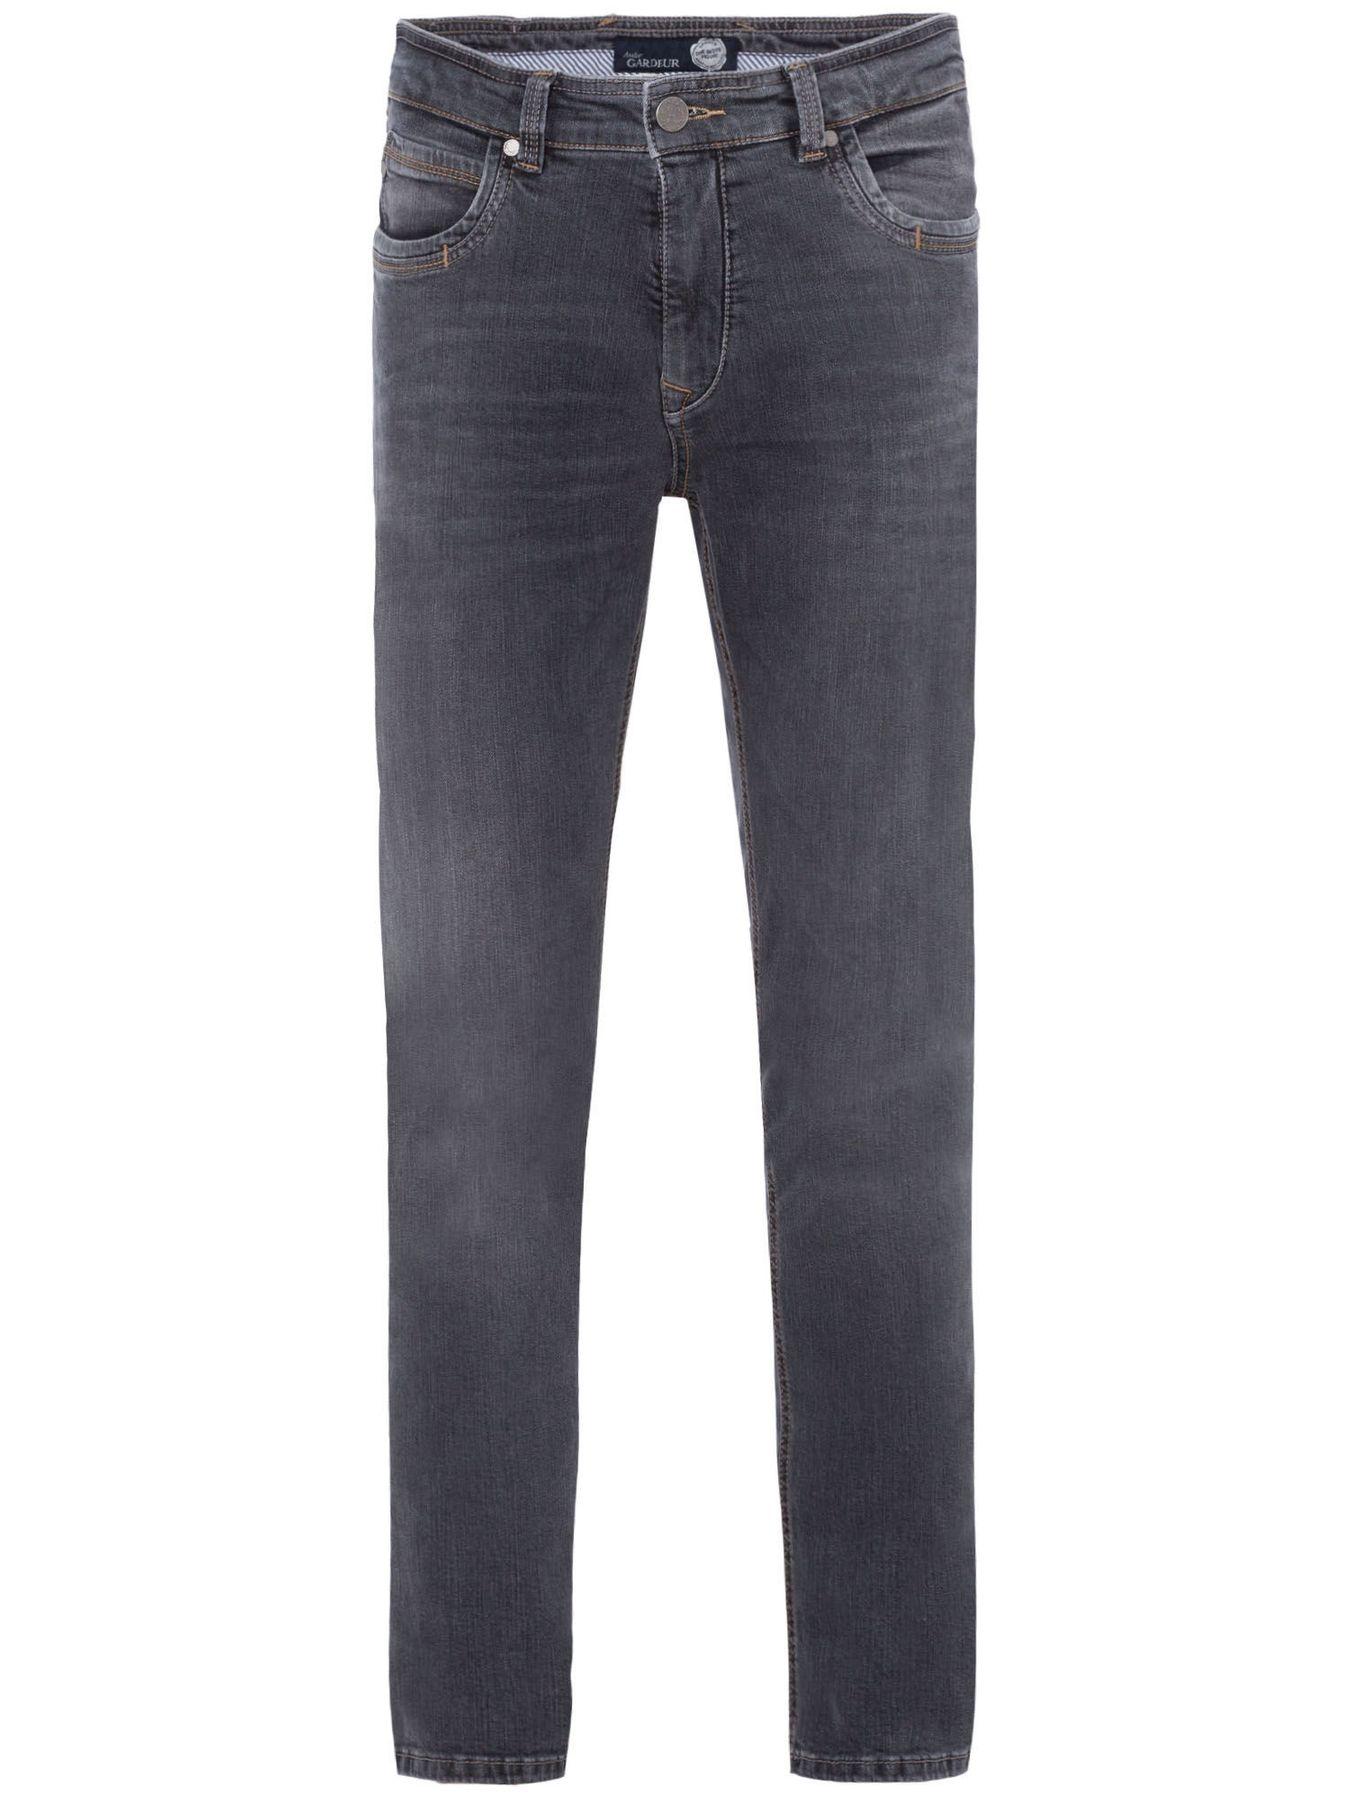 Atelier Gardeur - Herren 5-Pocket Jeans Superflex, Farben black(99), dark stone(68), stone blue(67), anthrazit(198) BATU (71001) – Bild 13